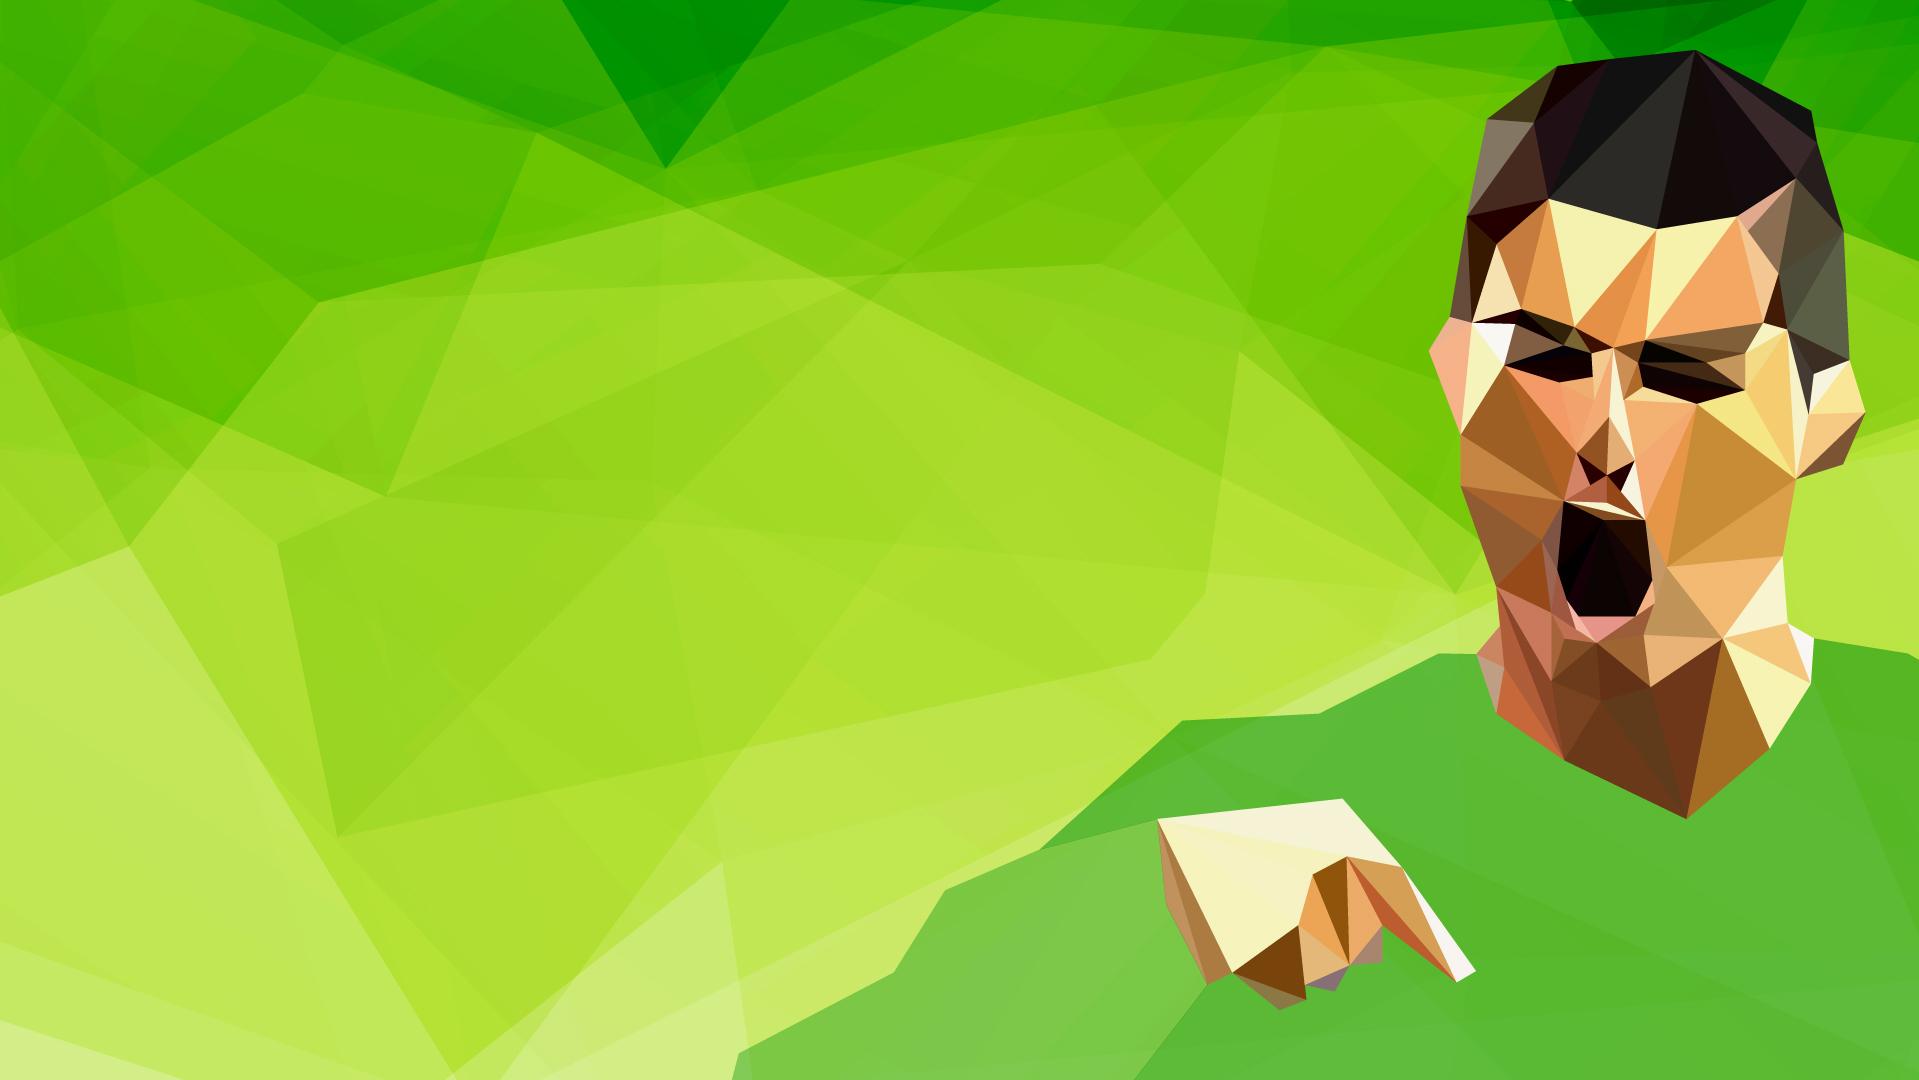 Cristiano Ronaldo Verde